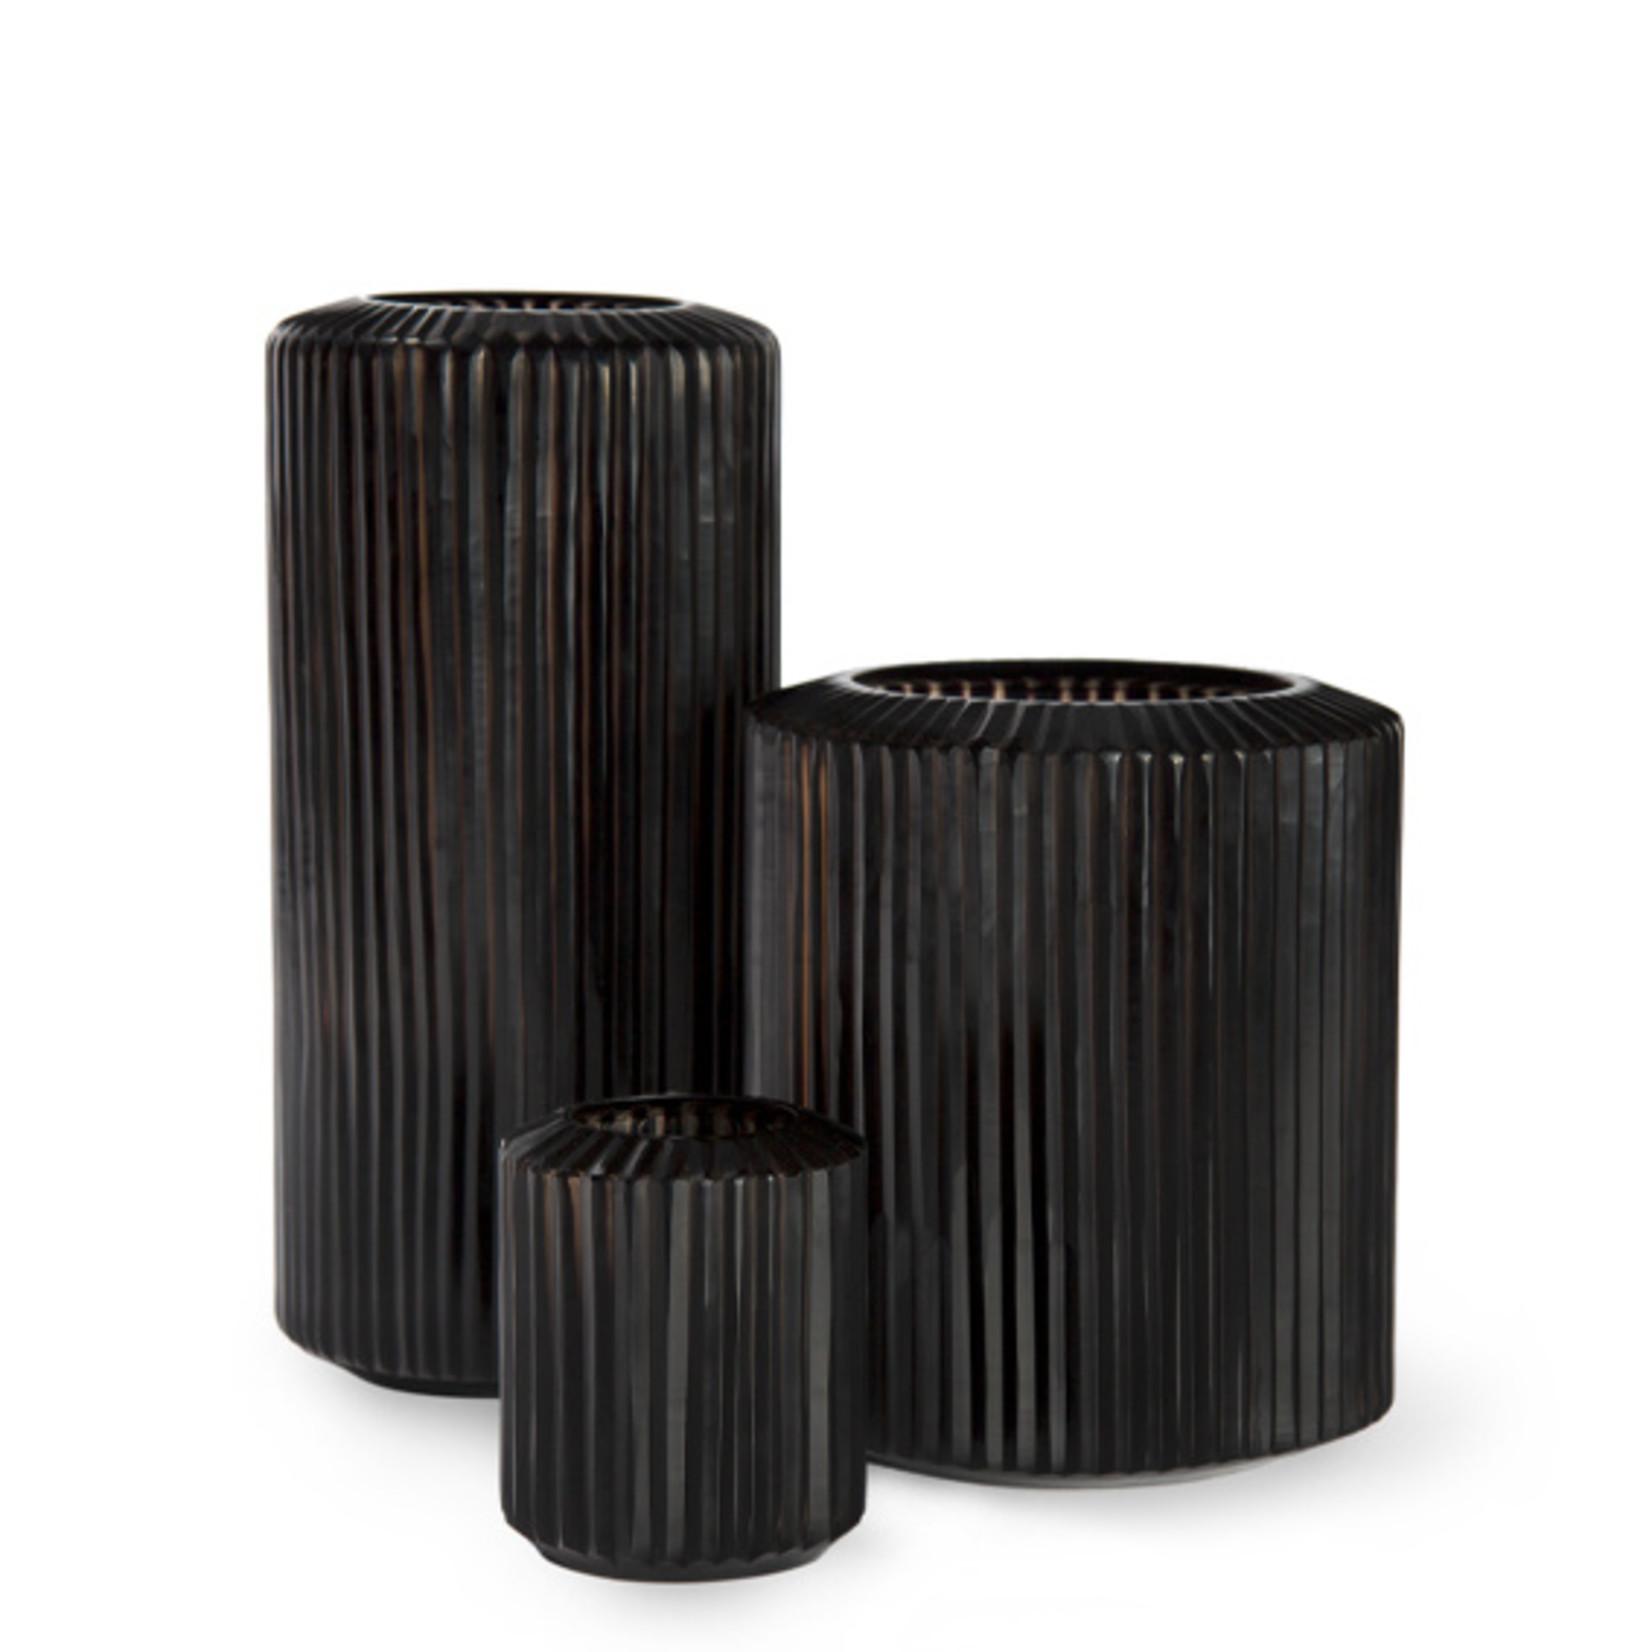 Guaxs Vase Omar M   Smoke Gray / Black